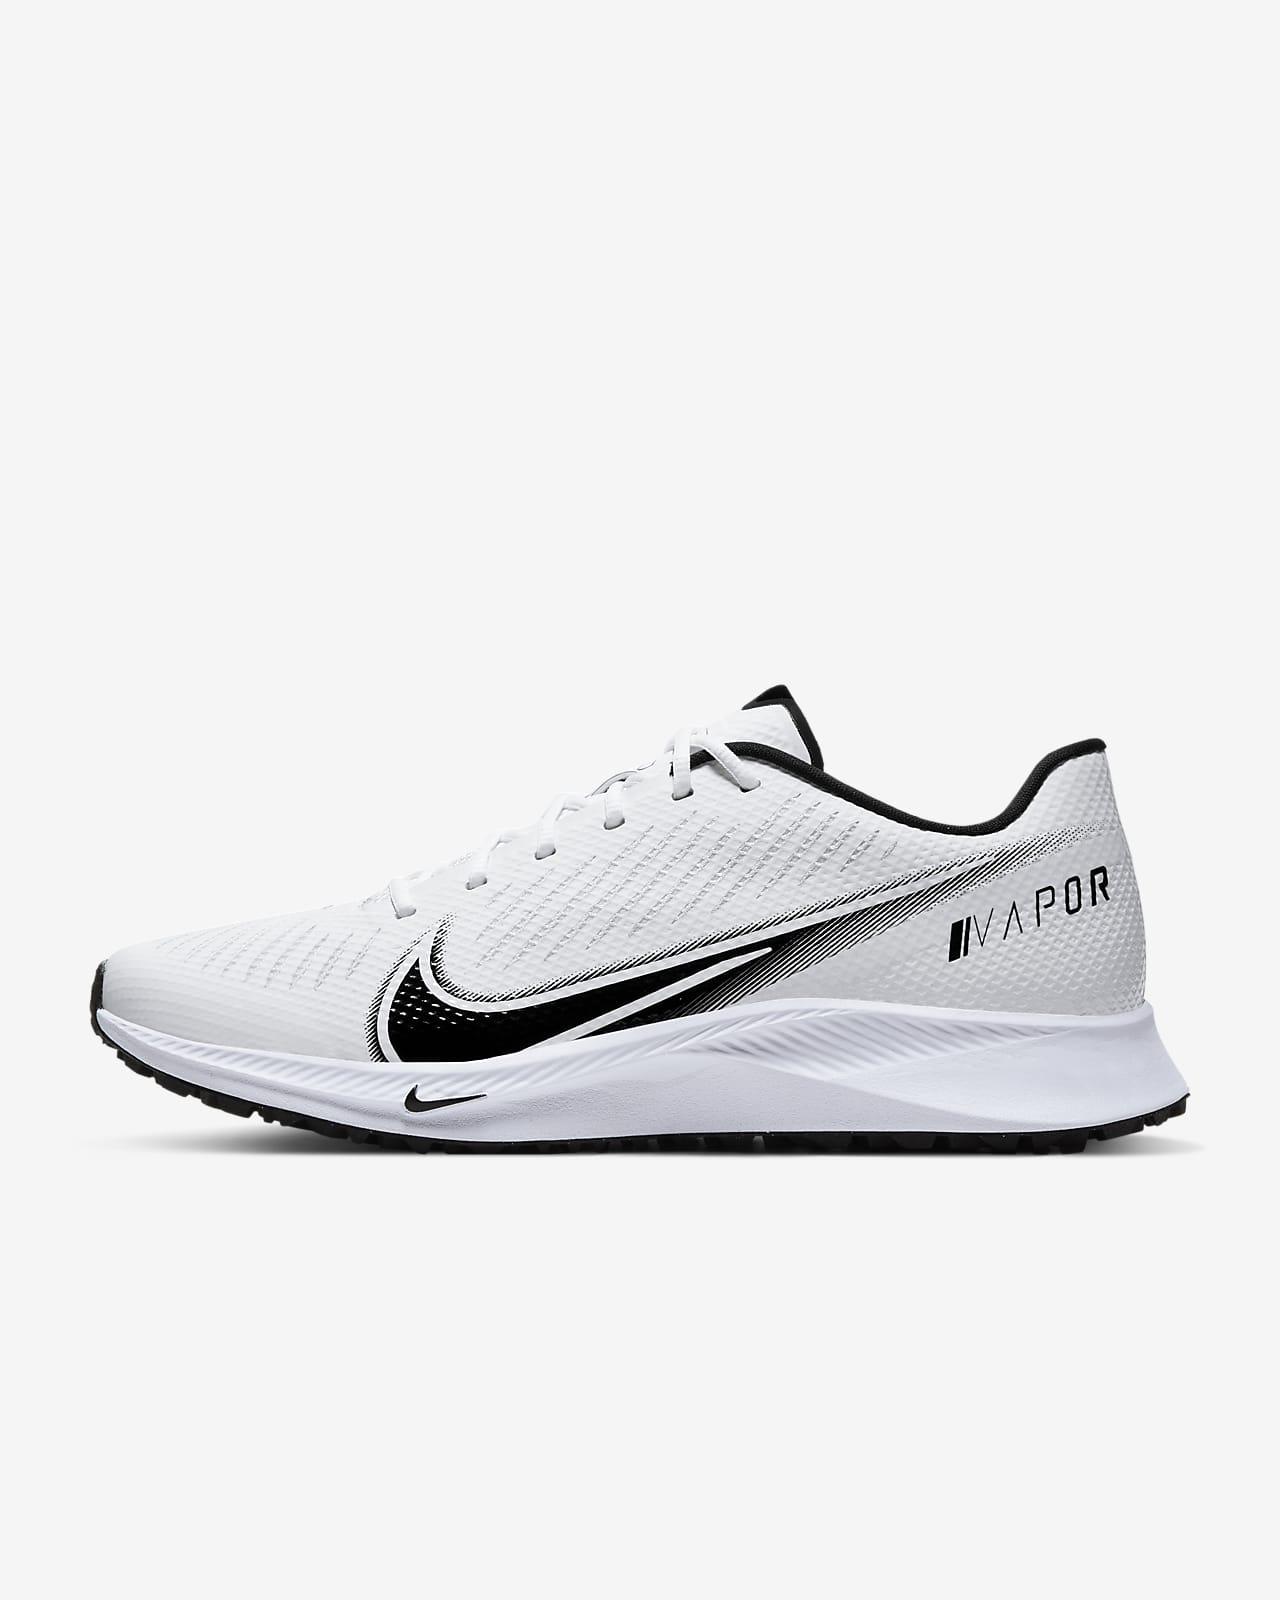 Deducir arena Convertir  Calzado de fútbol para hombre Nike Vapor Edge Turf. Nike.com